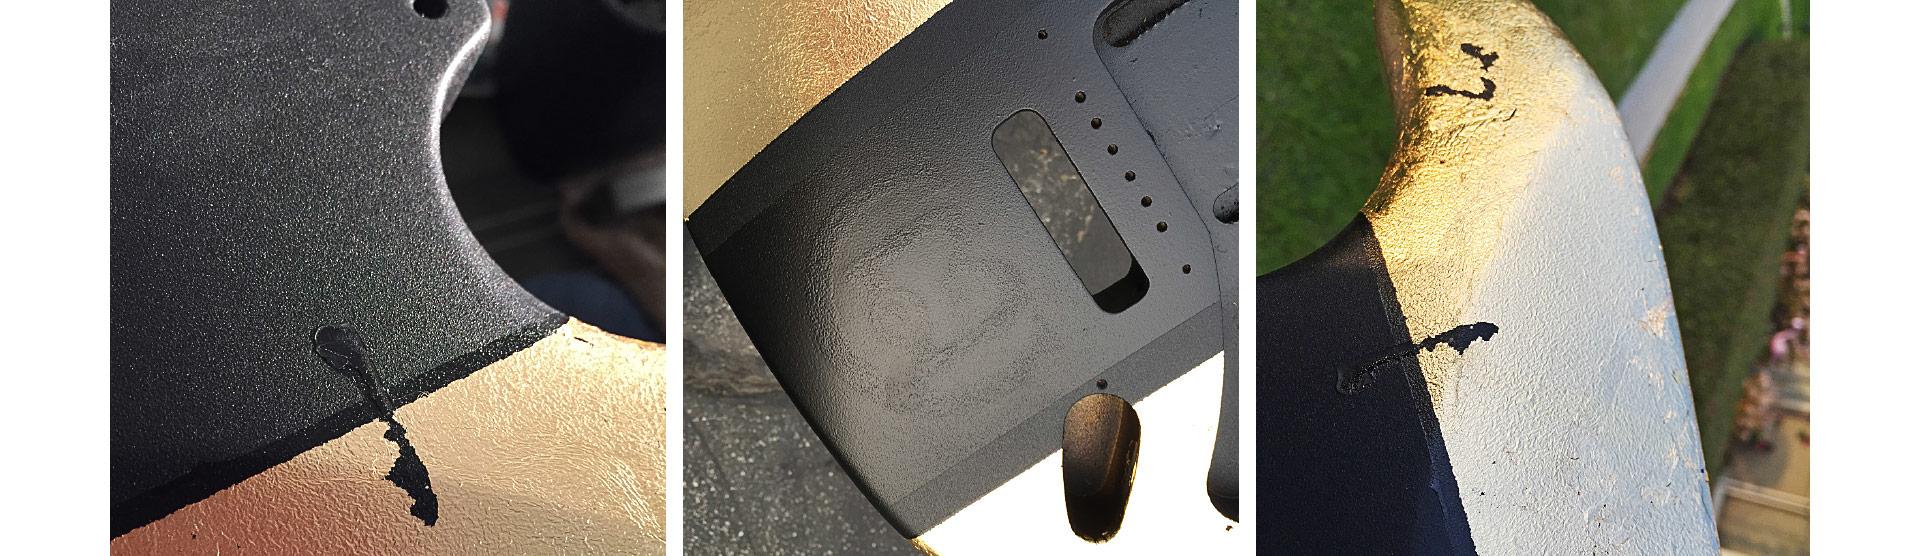 stratocaster-process-08@2x.jpg